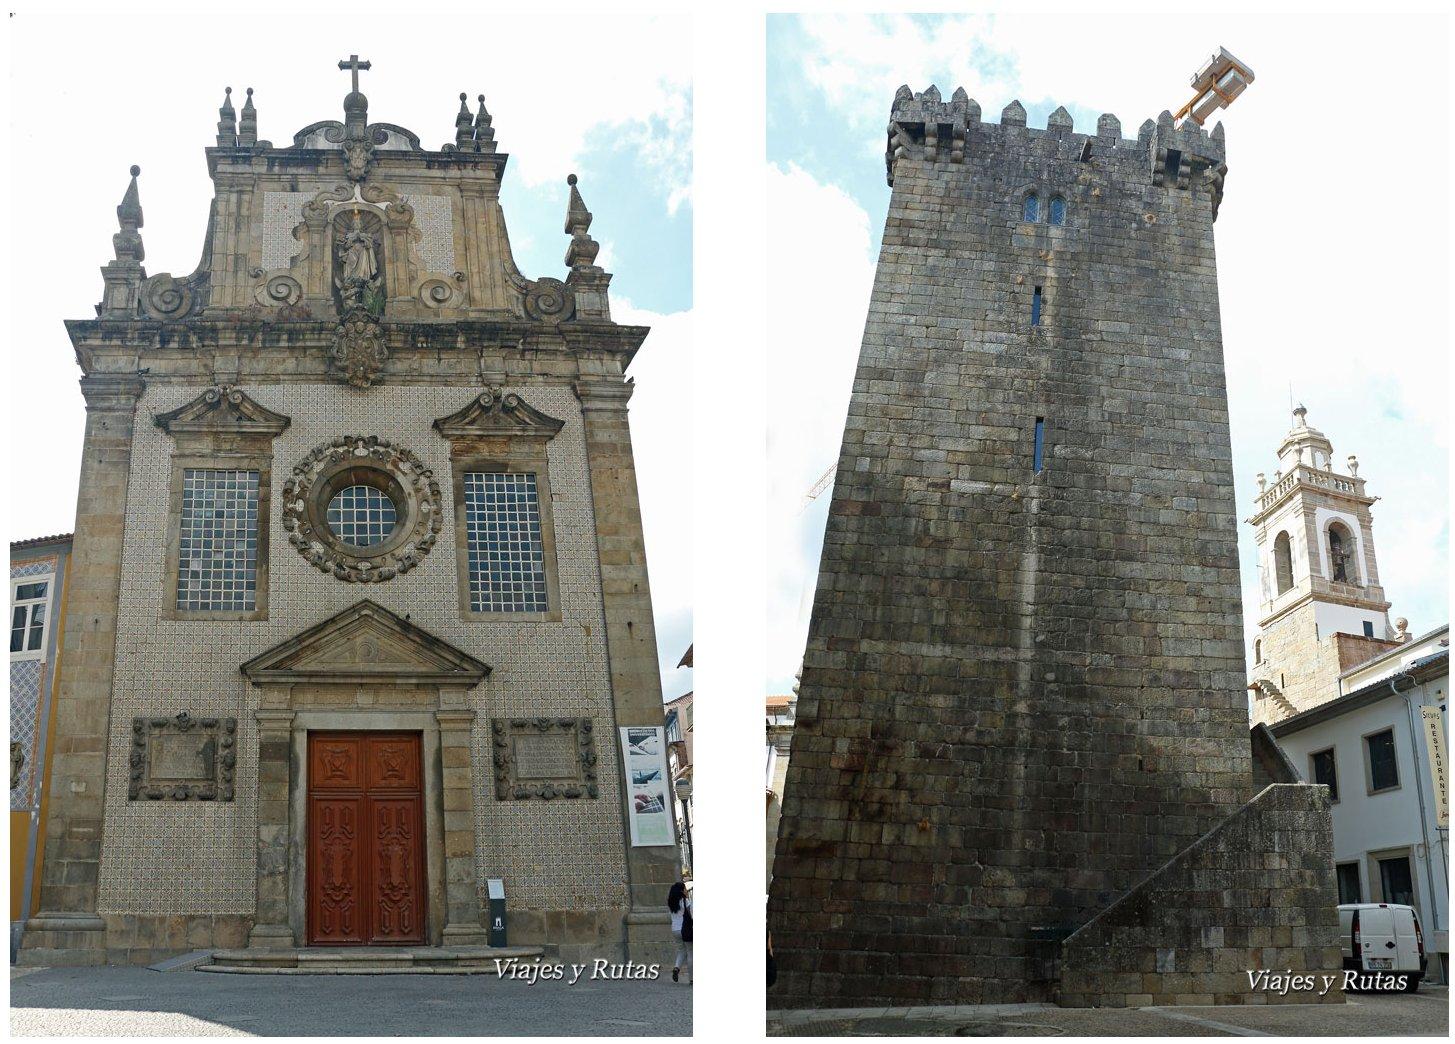 Torre del homenaje e iglesia de los terceiros, Braga